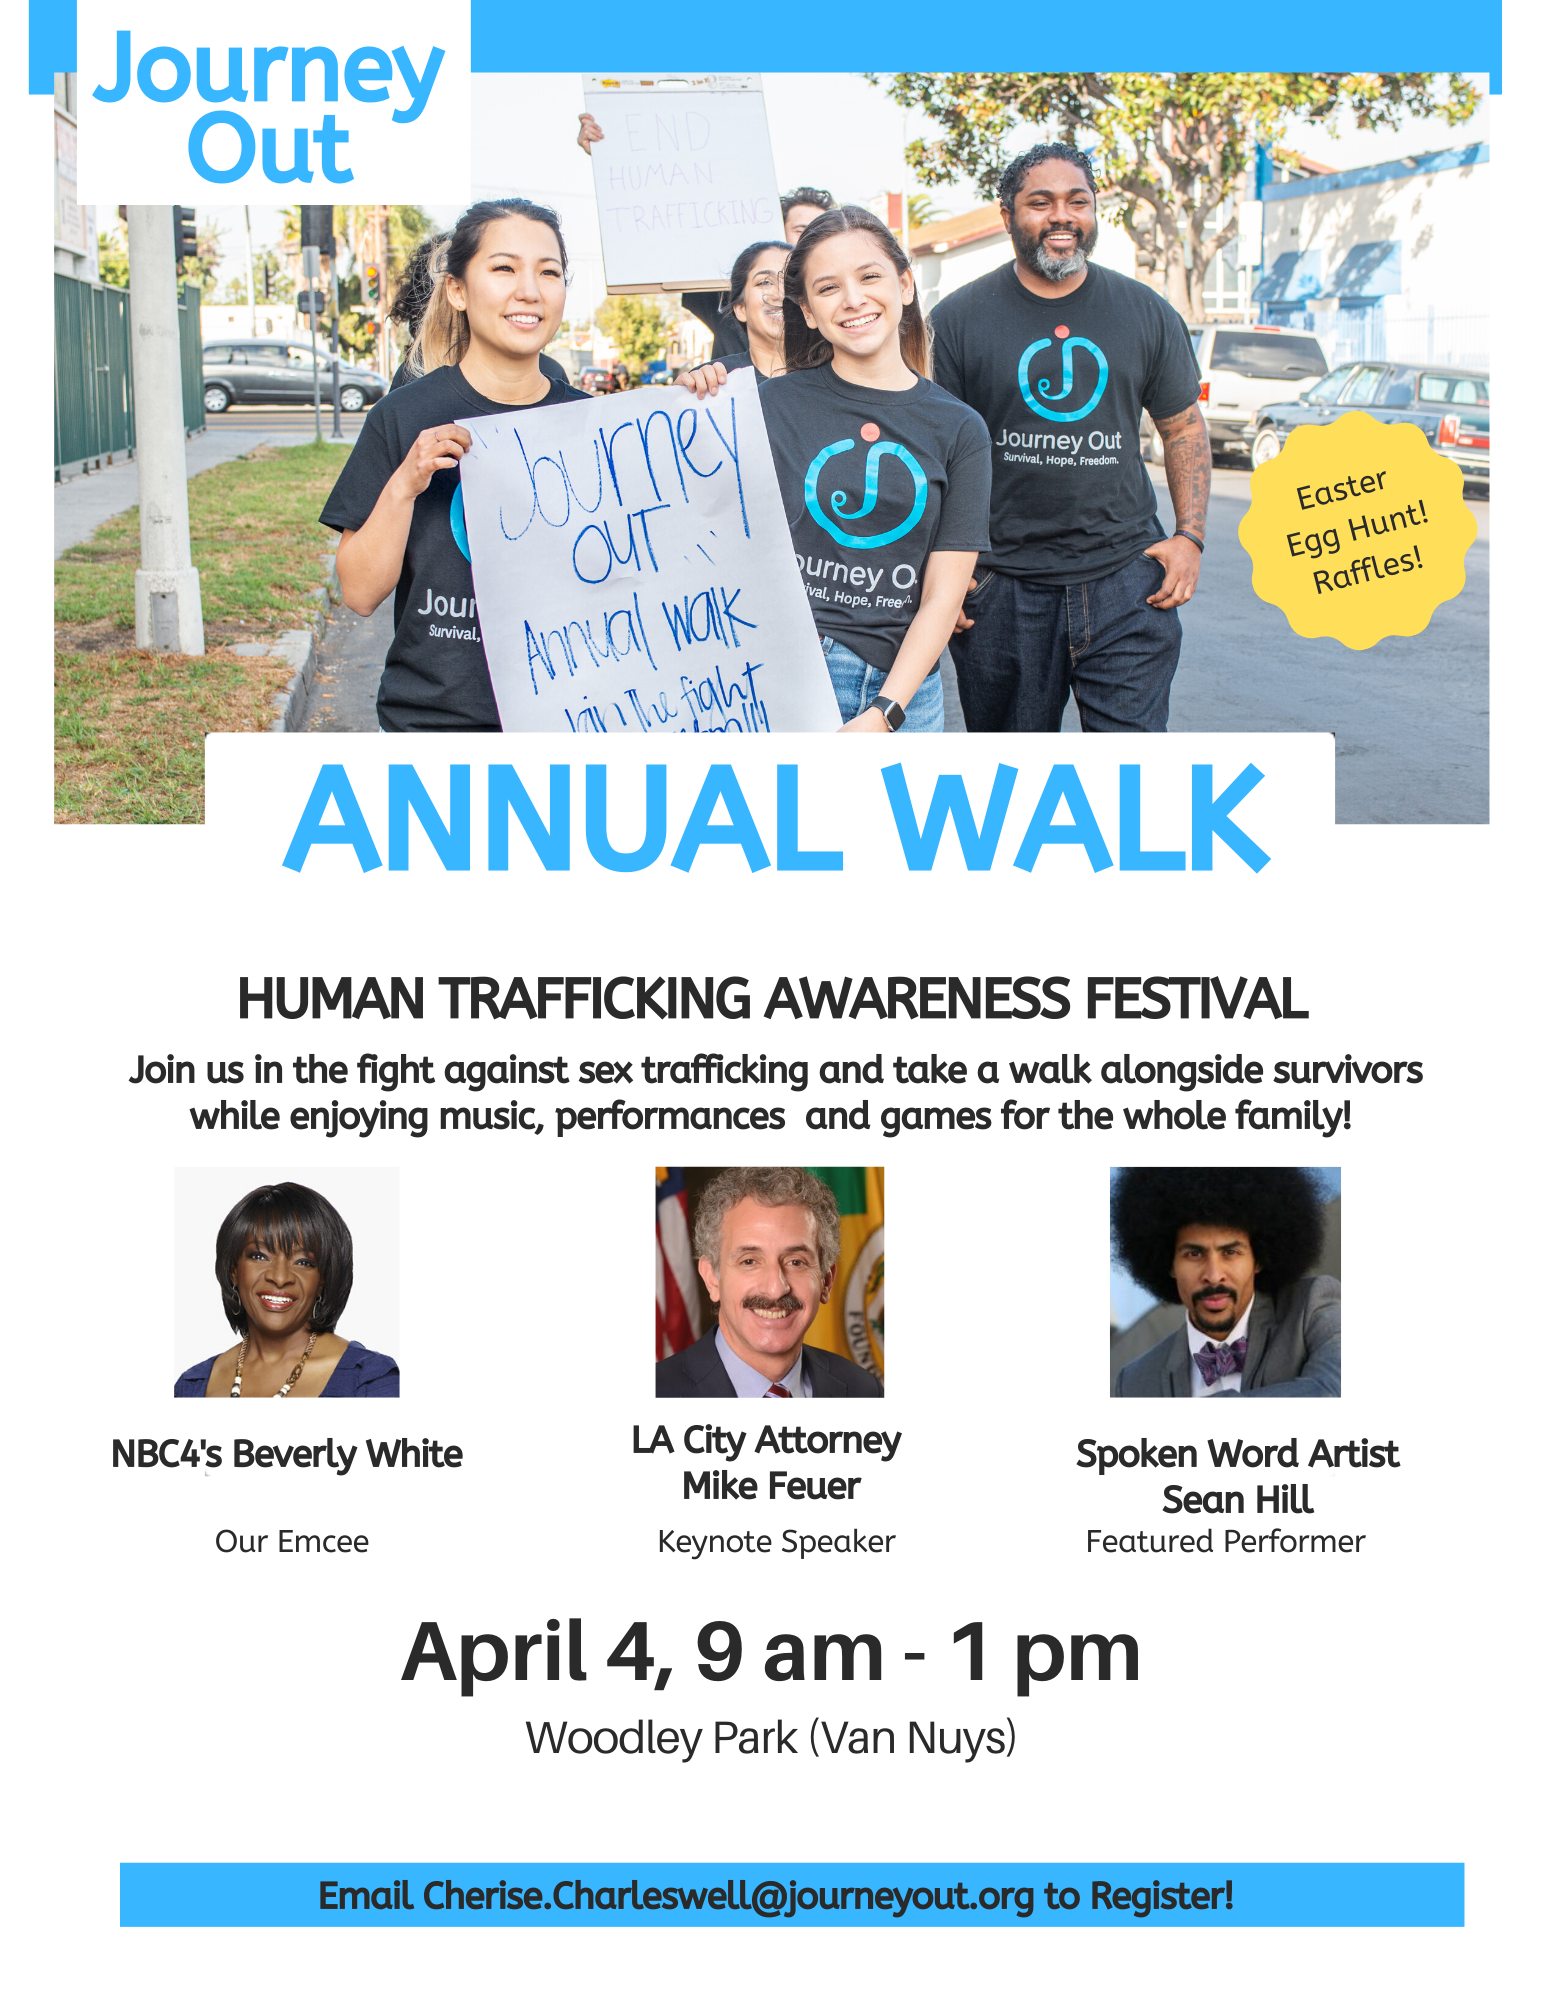 2020 Festival and Walk